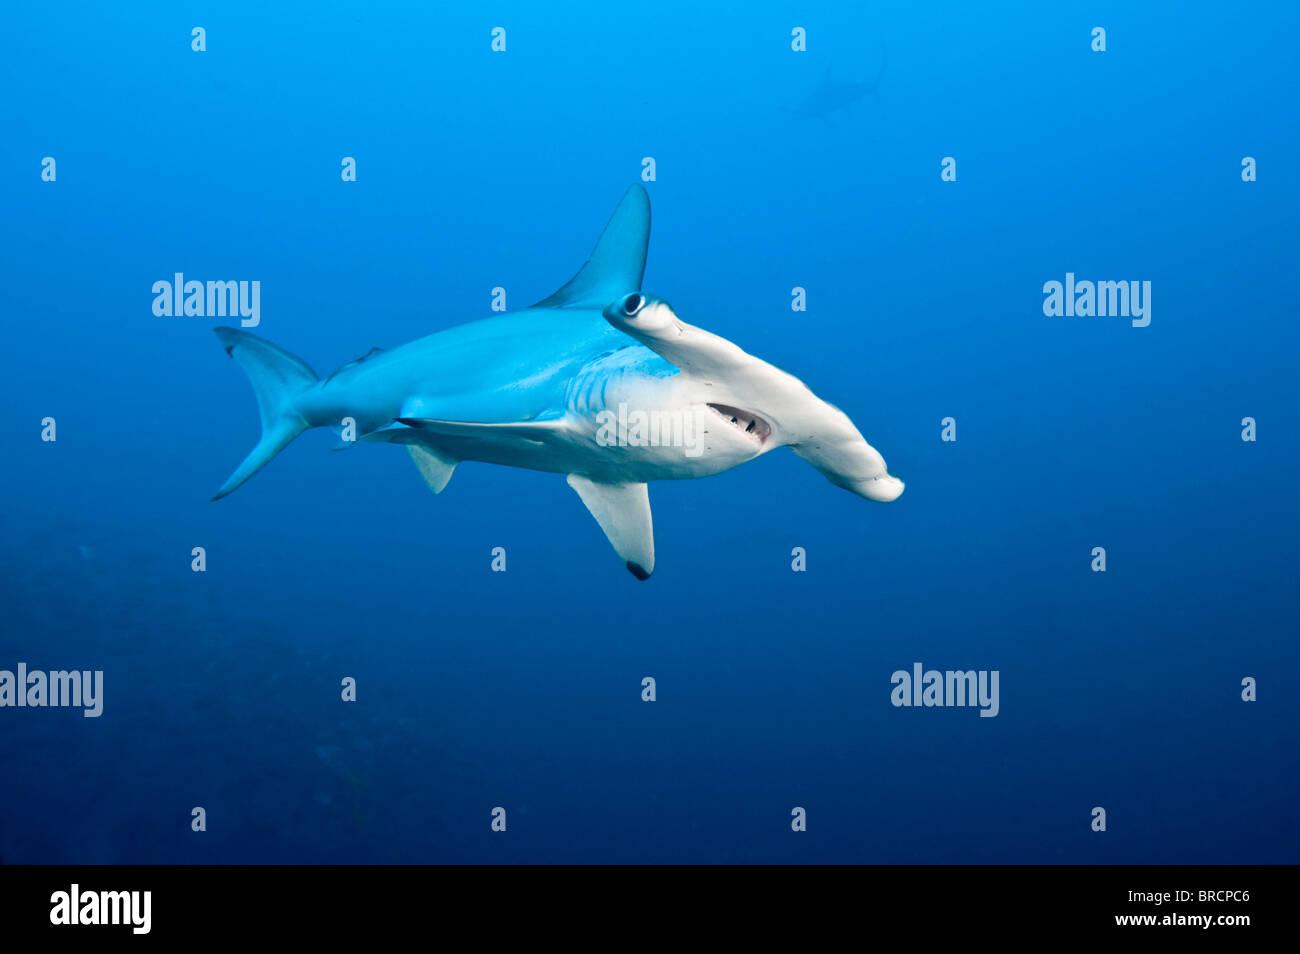 scalloped hammerhead shark, Sphyrna lewini, Cocos Island, Costa Rica, East Pacific Ocean - Stock Image